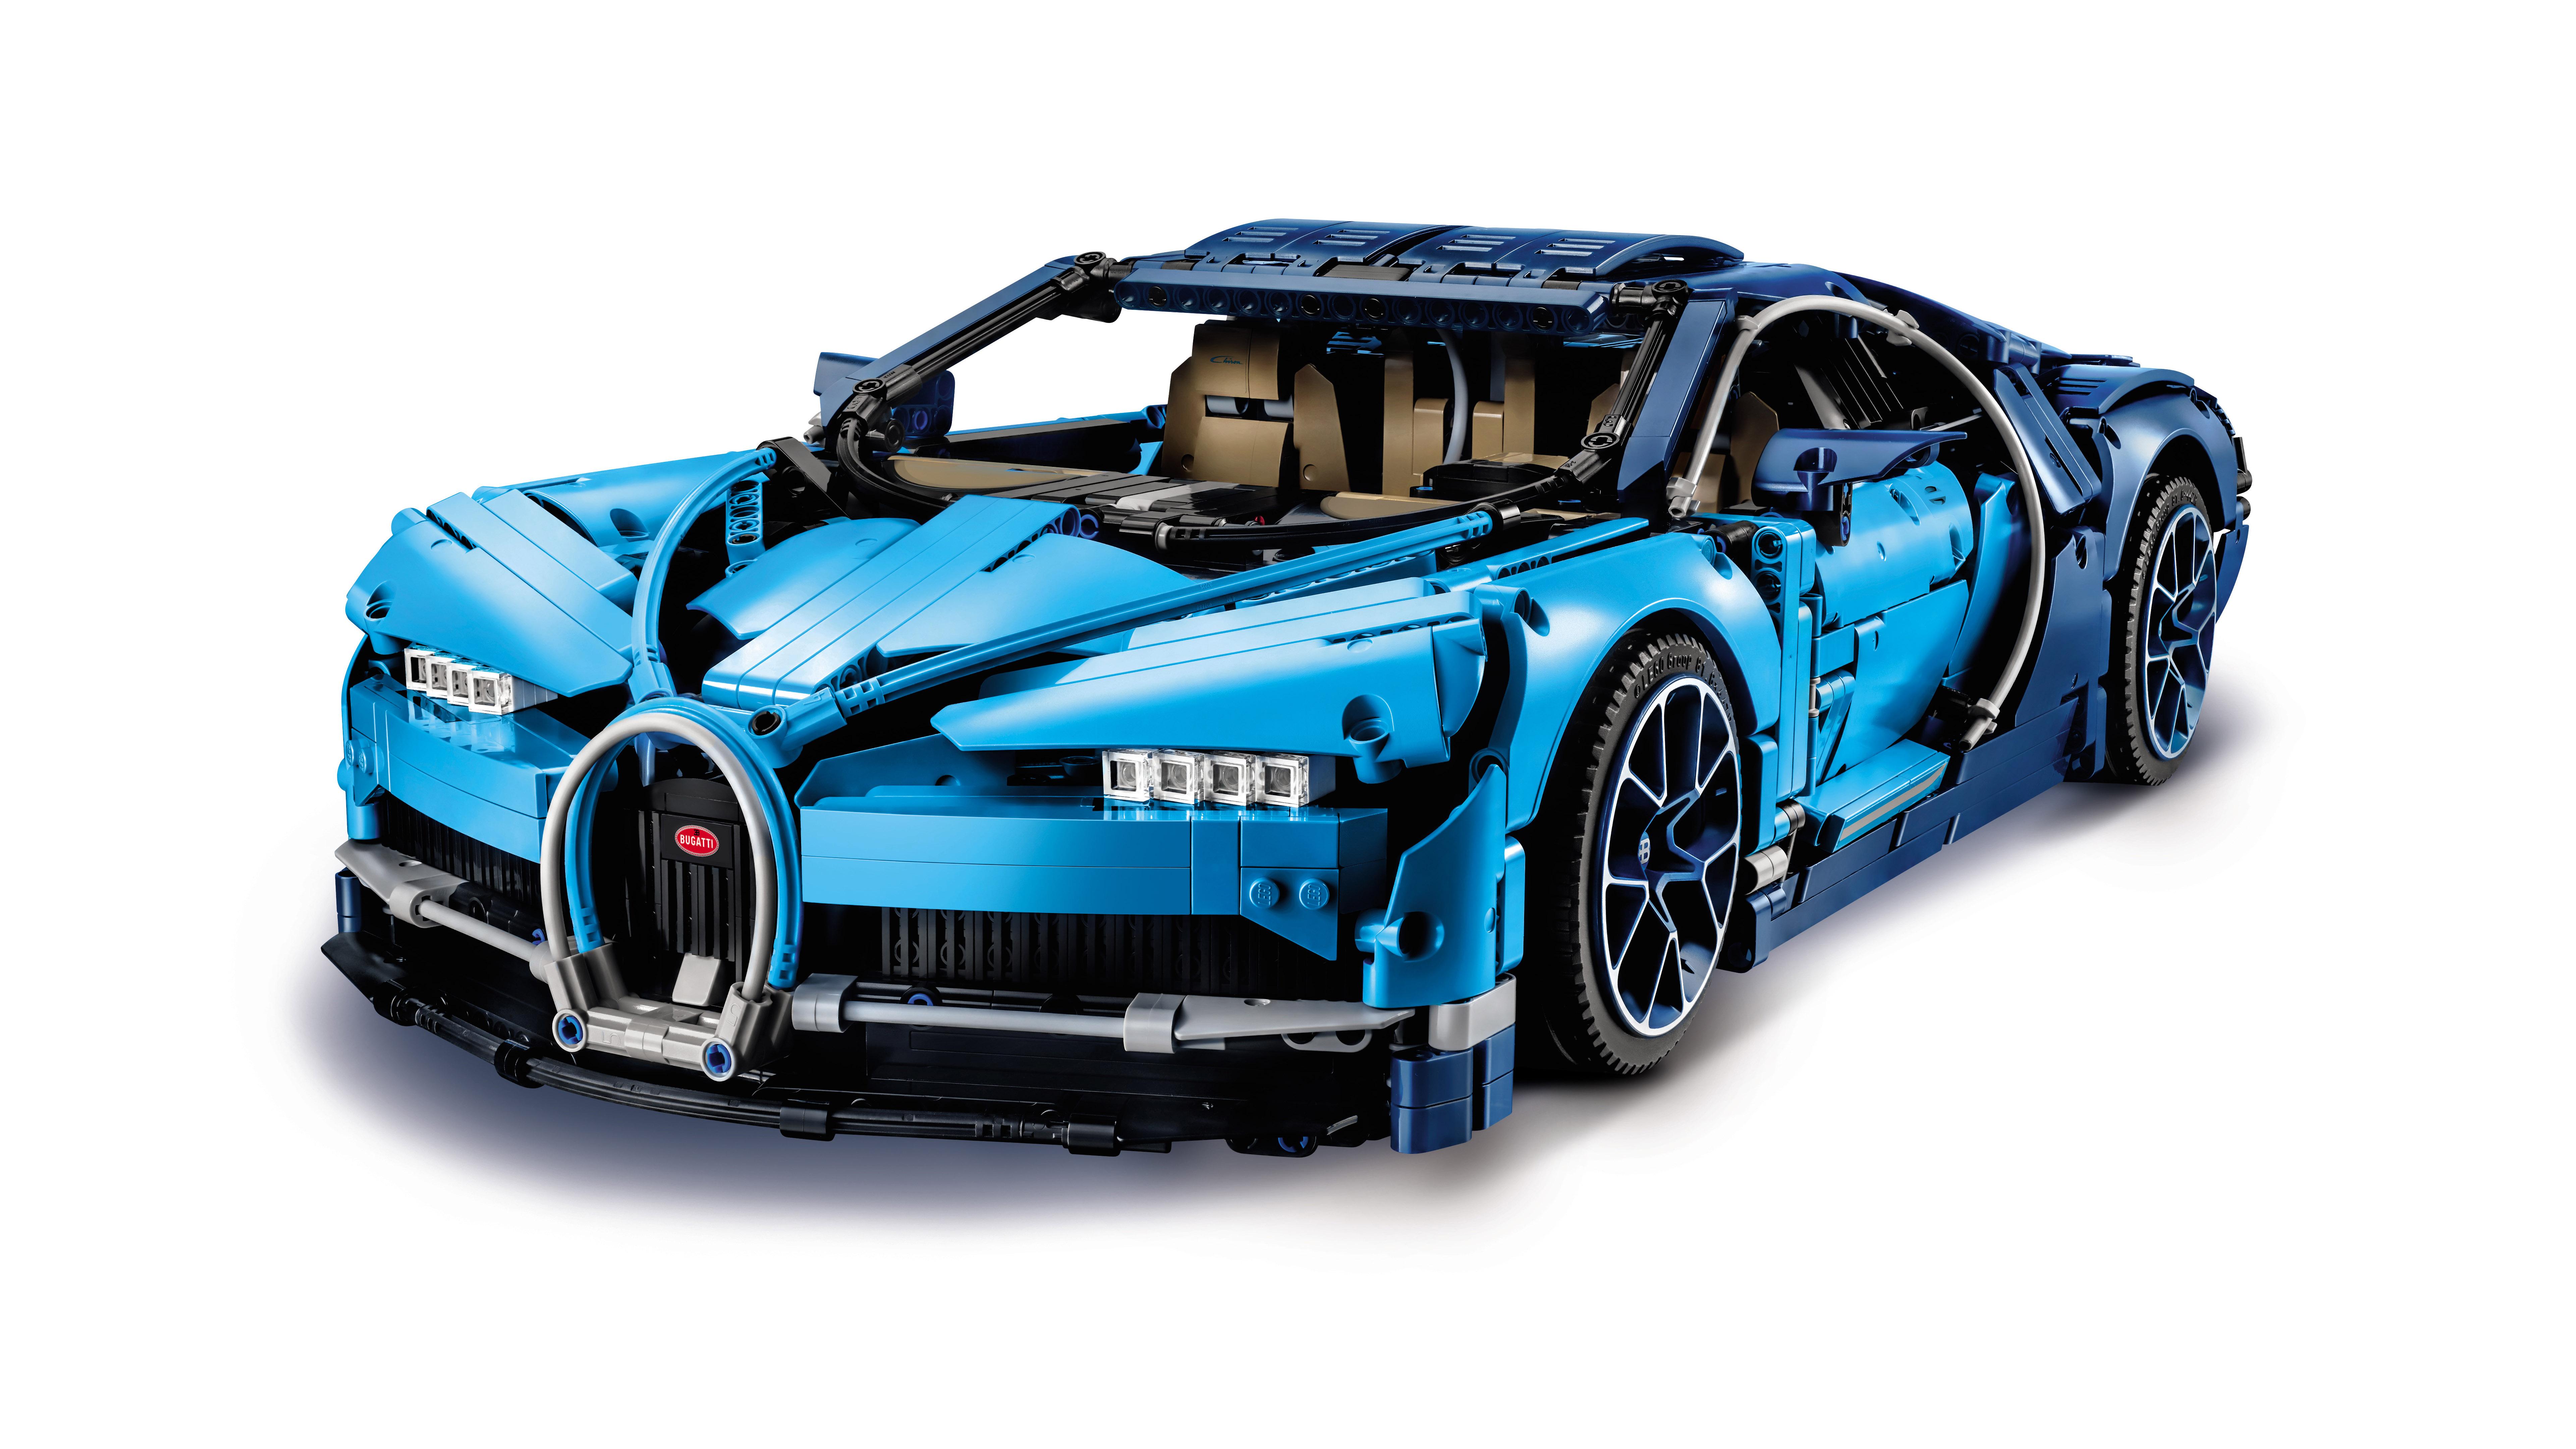 1440x2960 Lego Bugatti Chiron Sport 8k Samsung Galaxy Note 9 8 S9